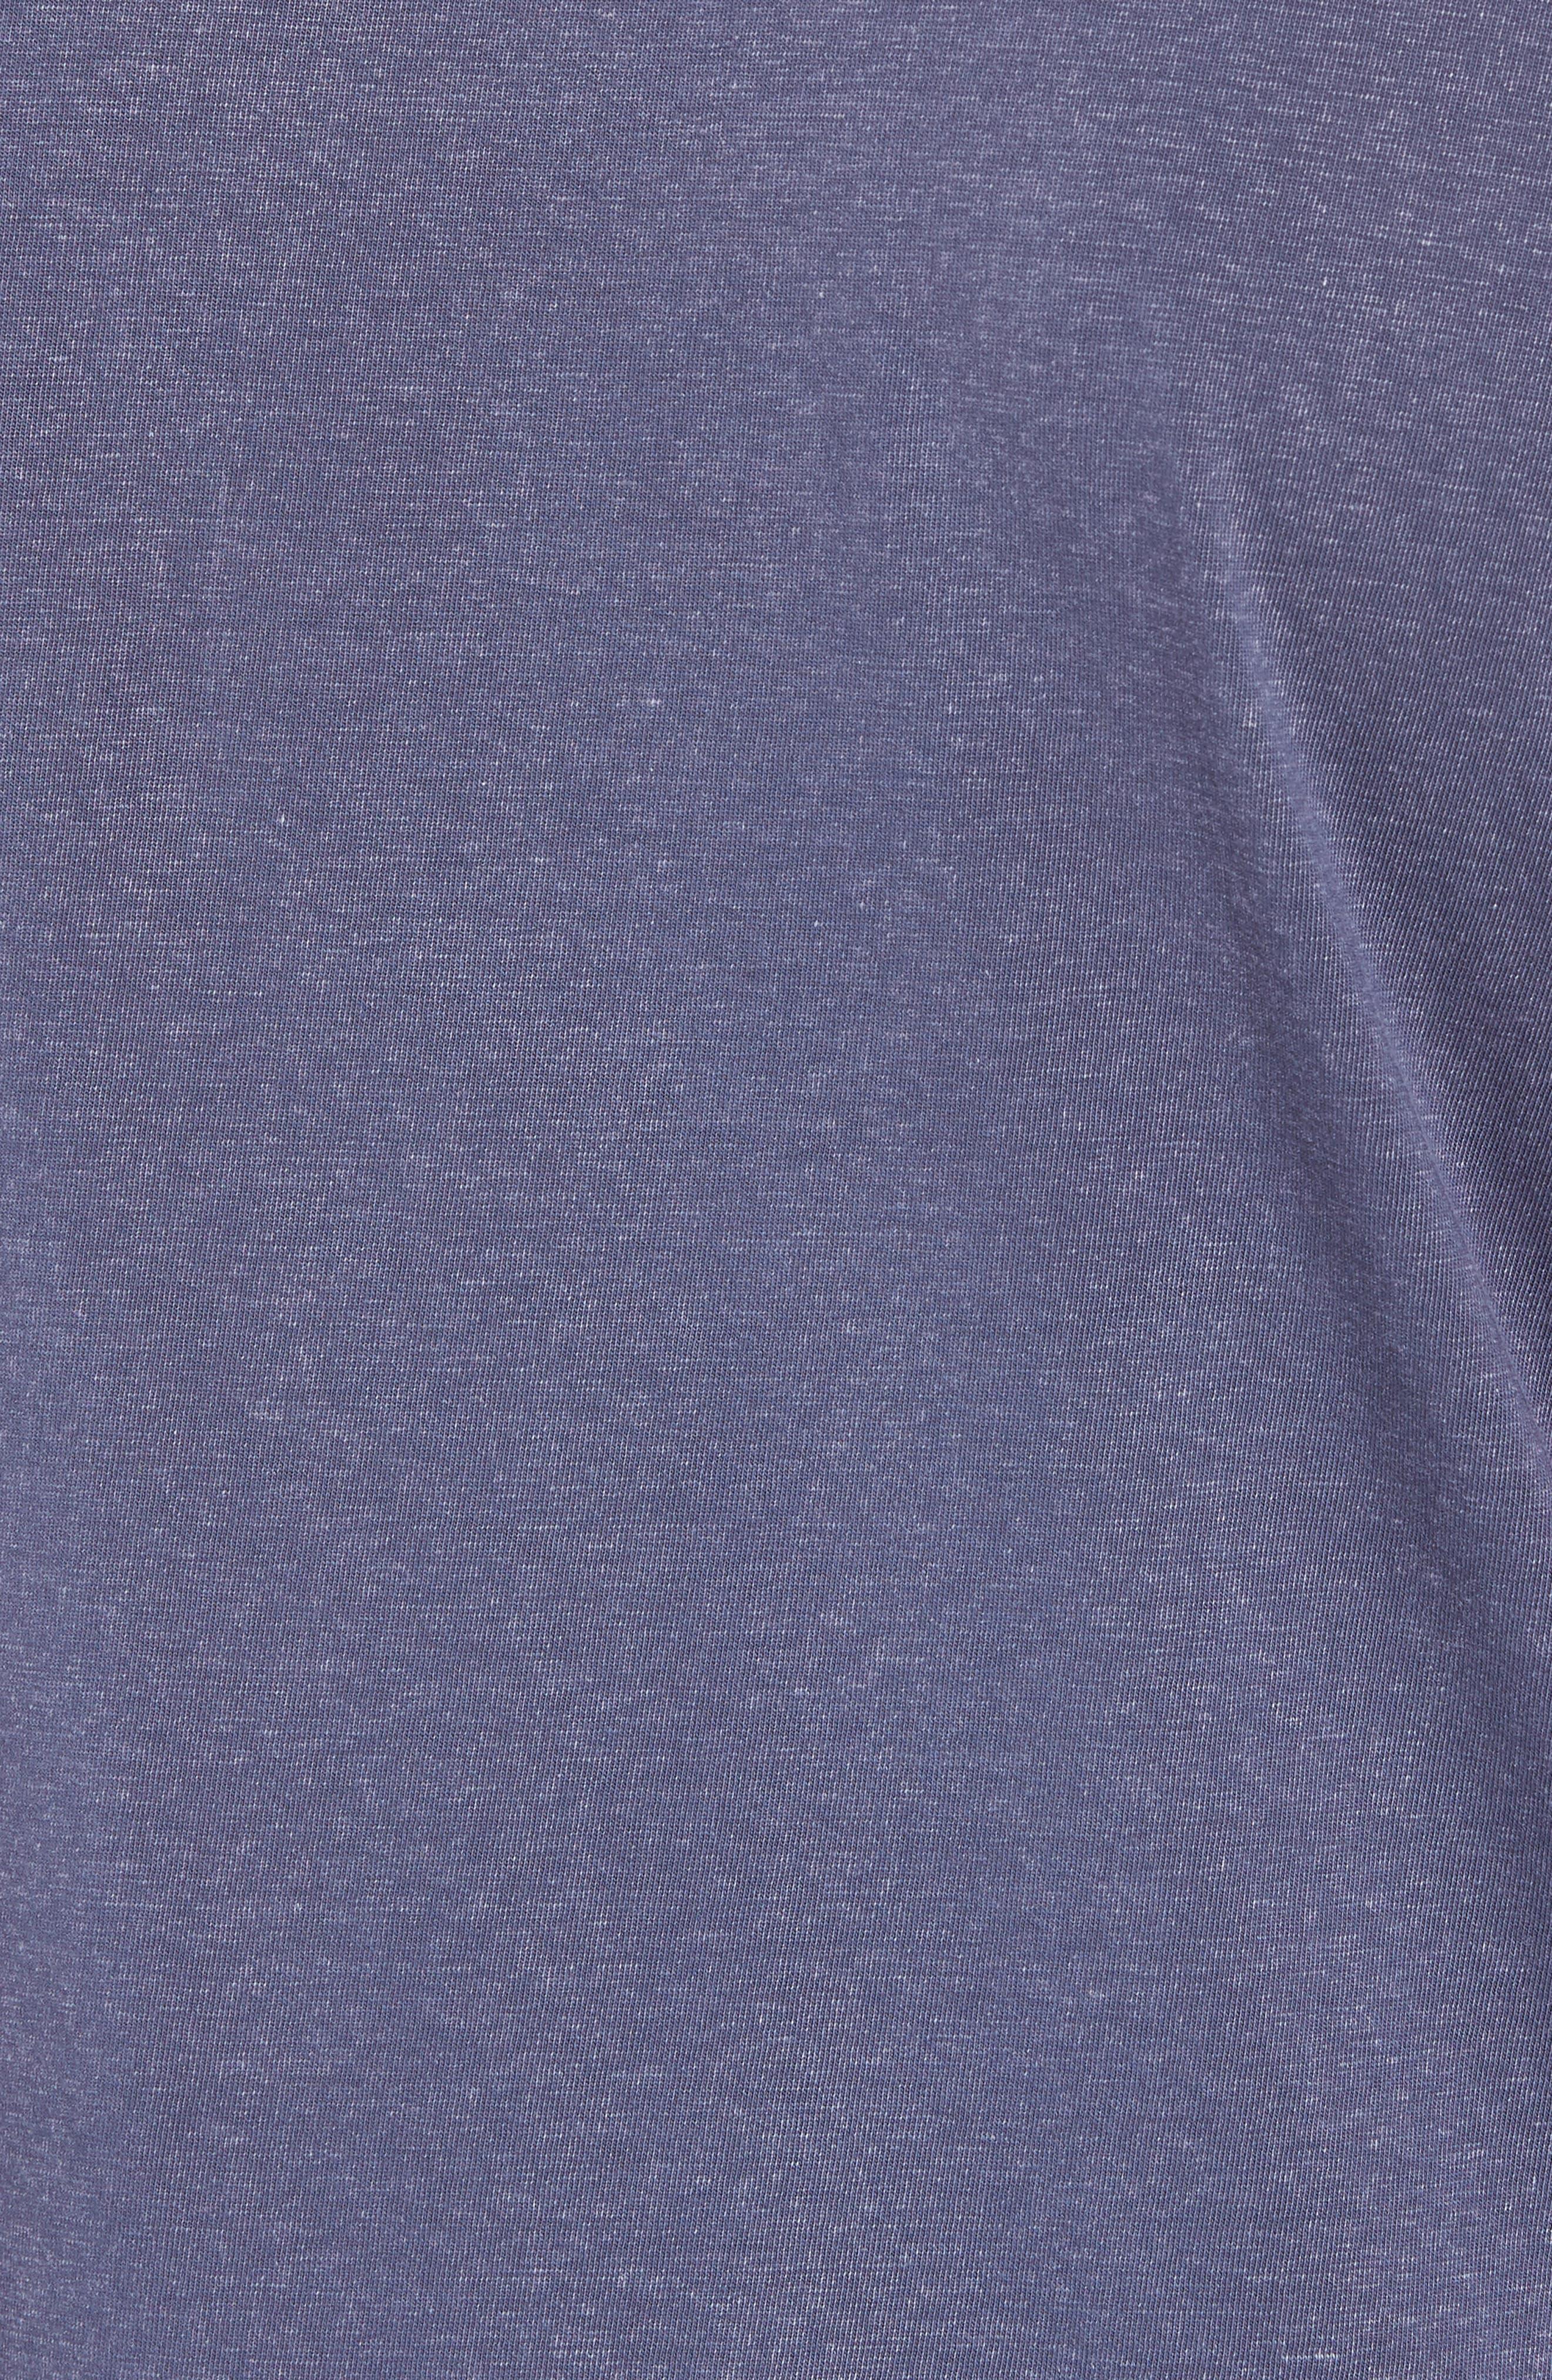 Regular Fit Polo,                             Alternate thumbnail 5, color,                             DRY LAVENDER